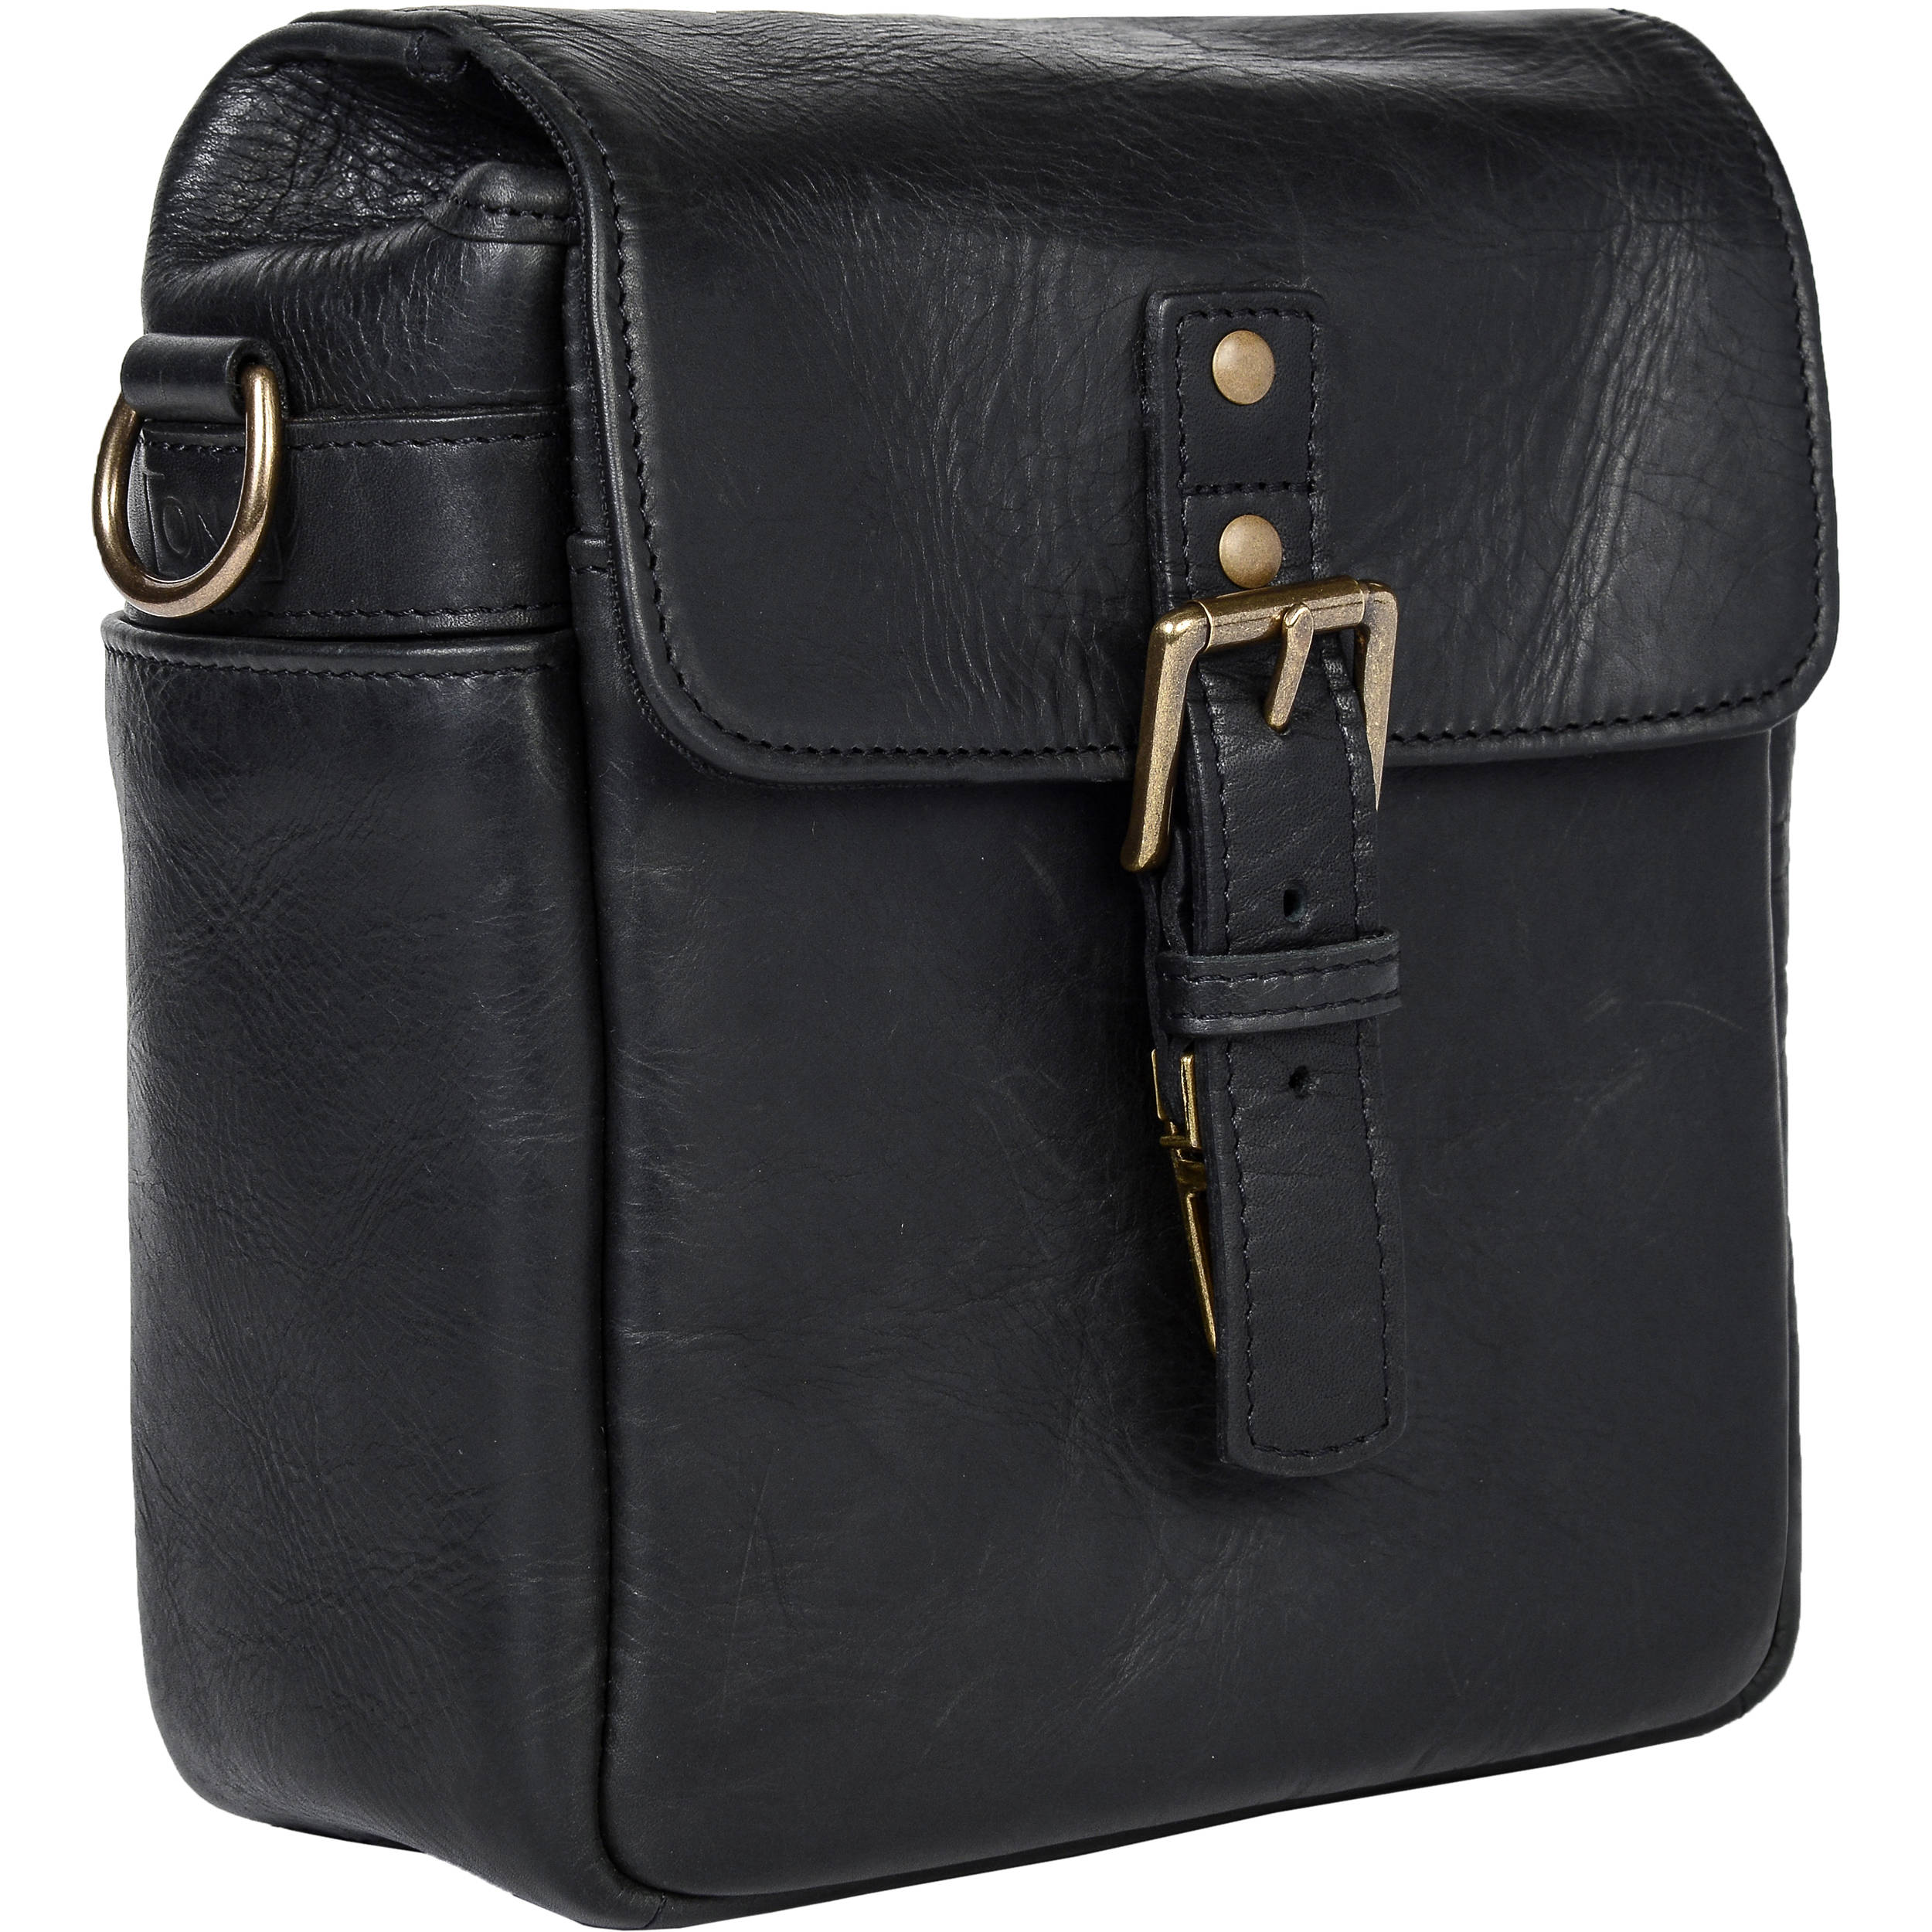 ONA Bond Street Leather Camera Bag (Black) ONA5-064LBL B&H ...